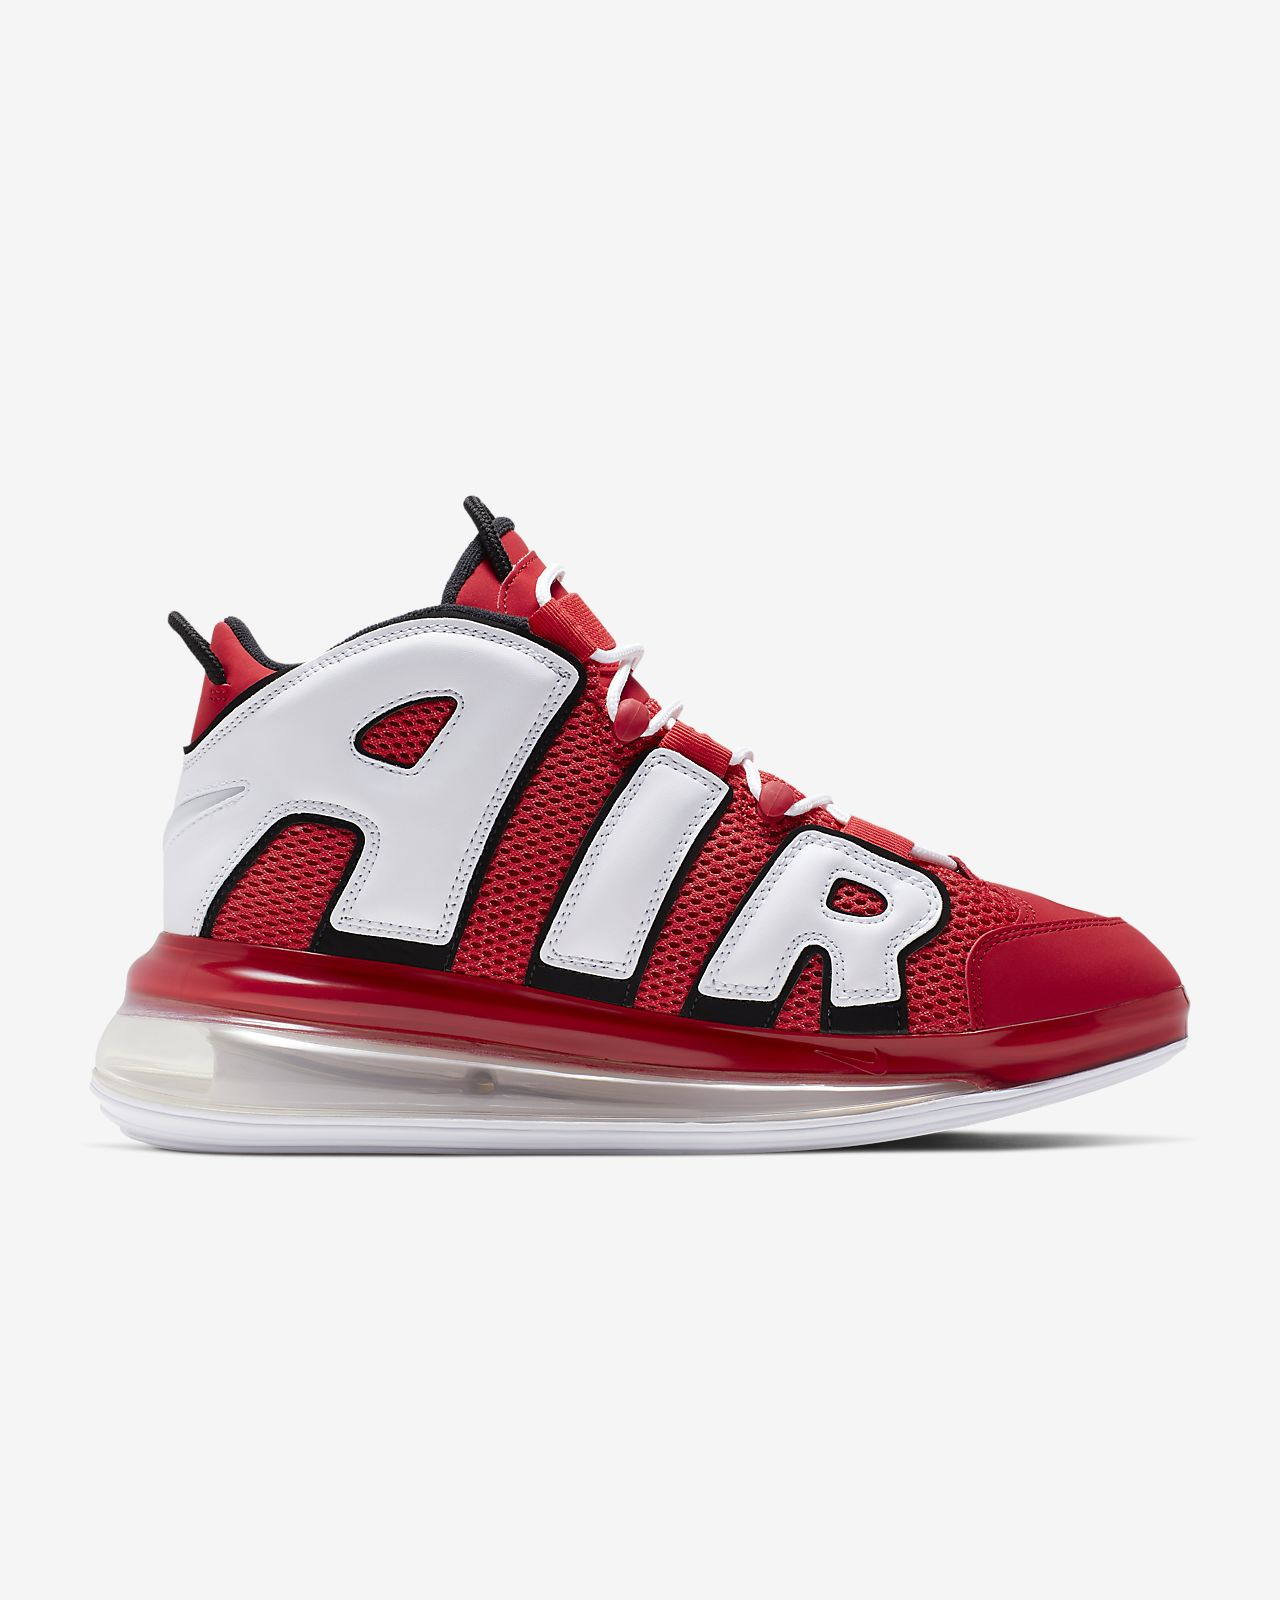 online store 89478 5512a ... Nike Air More Uptempo 720 QS 2 Men s Shoe